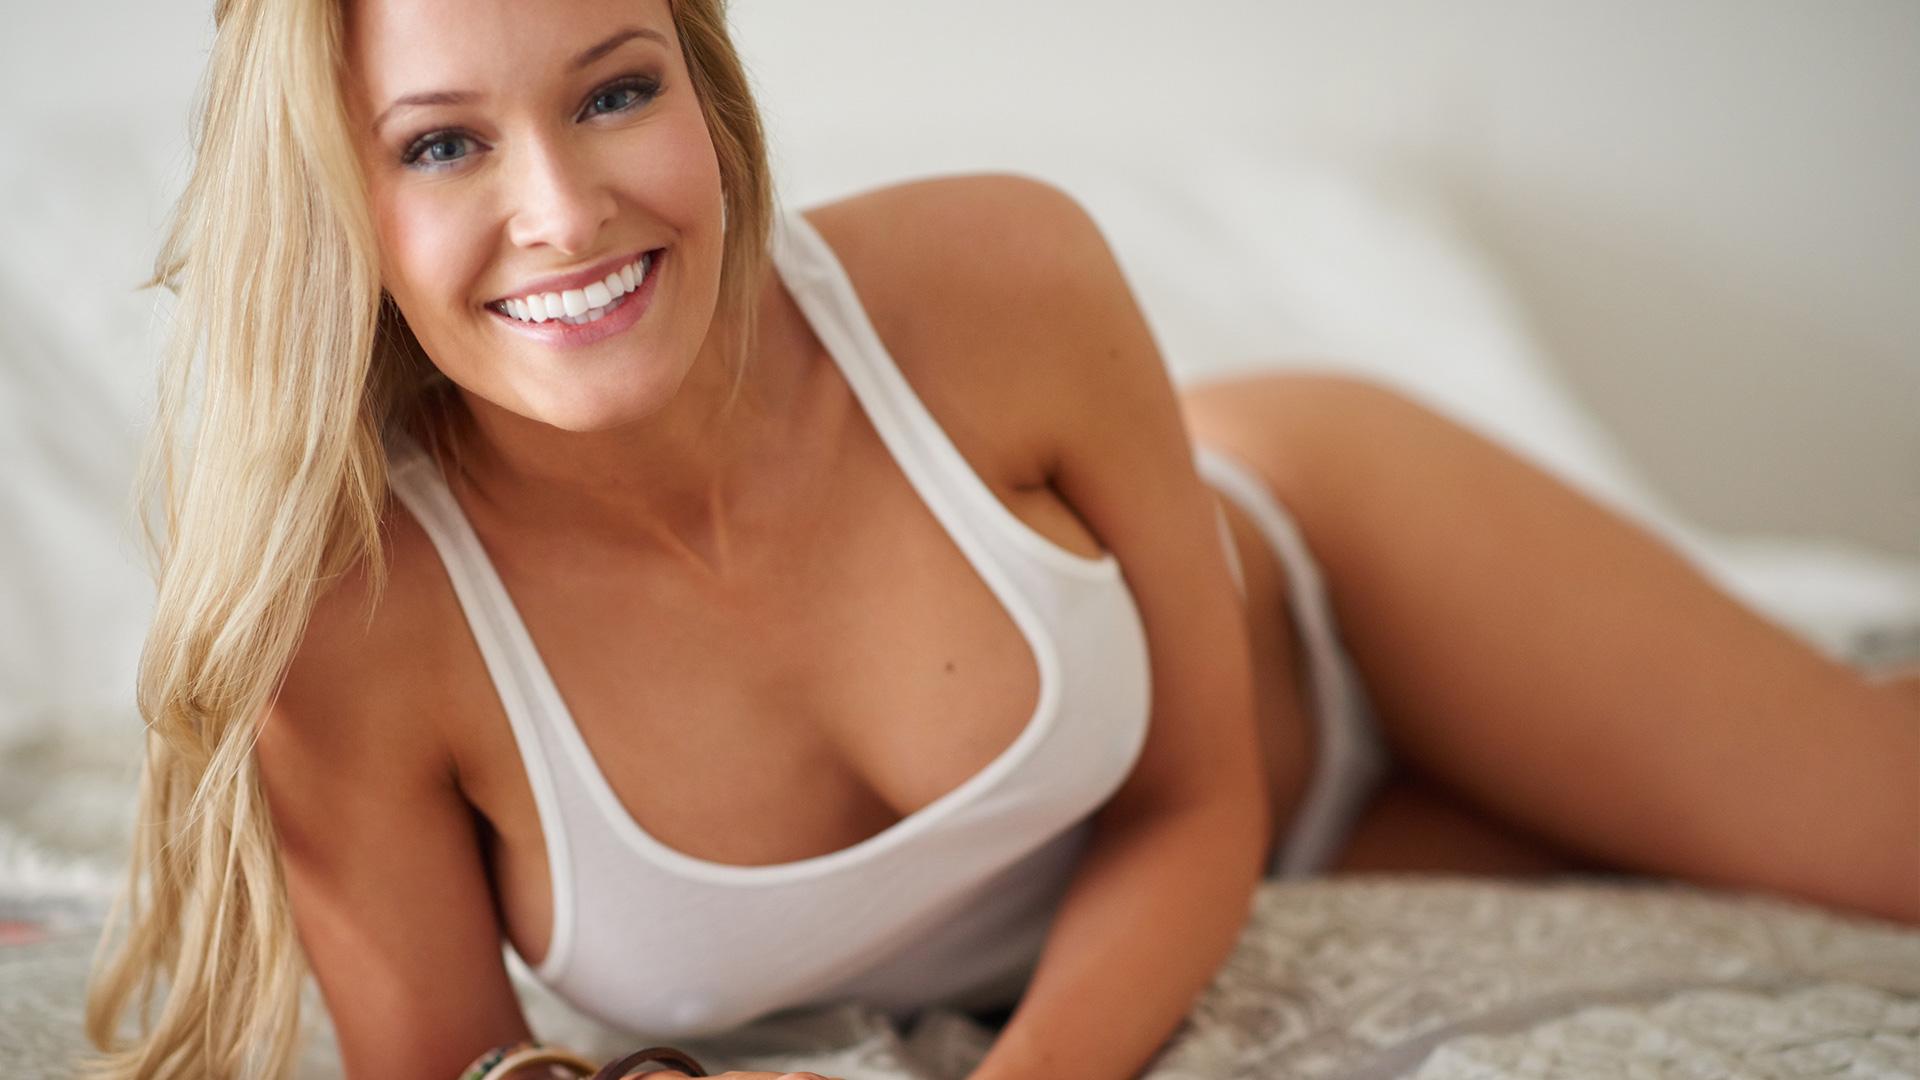 brystforstorring